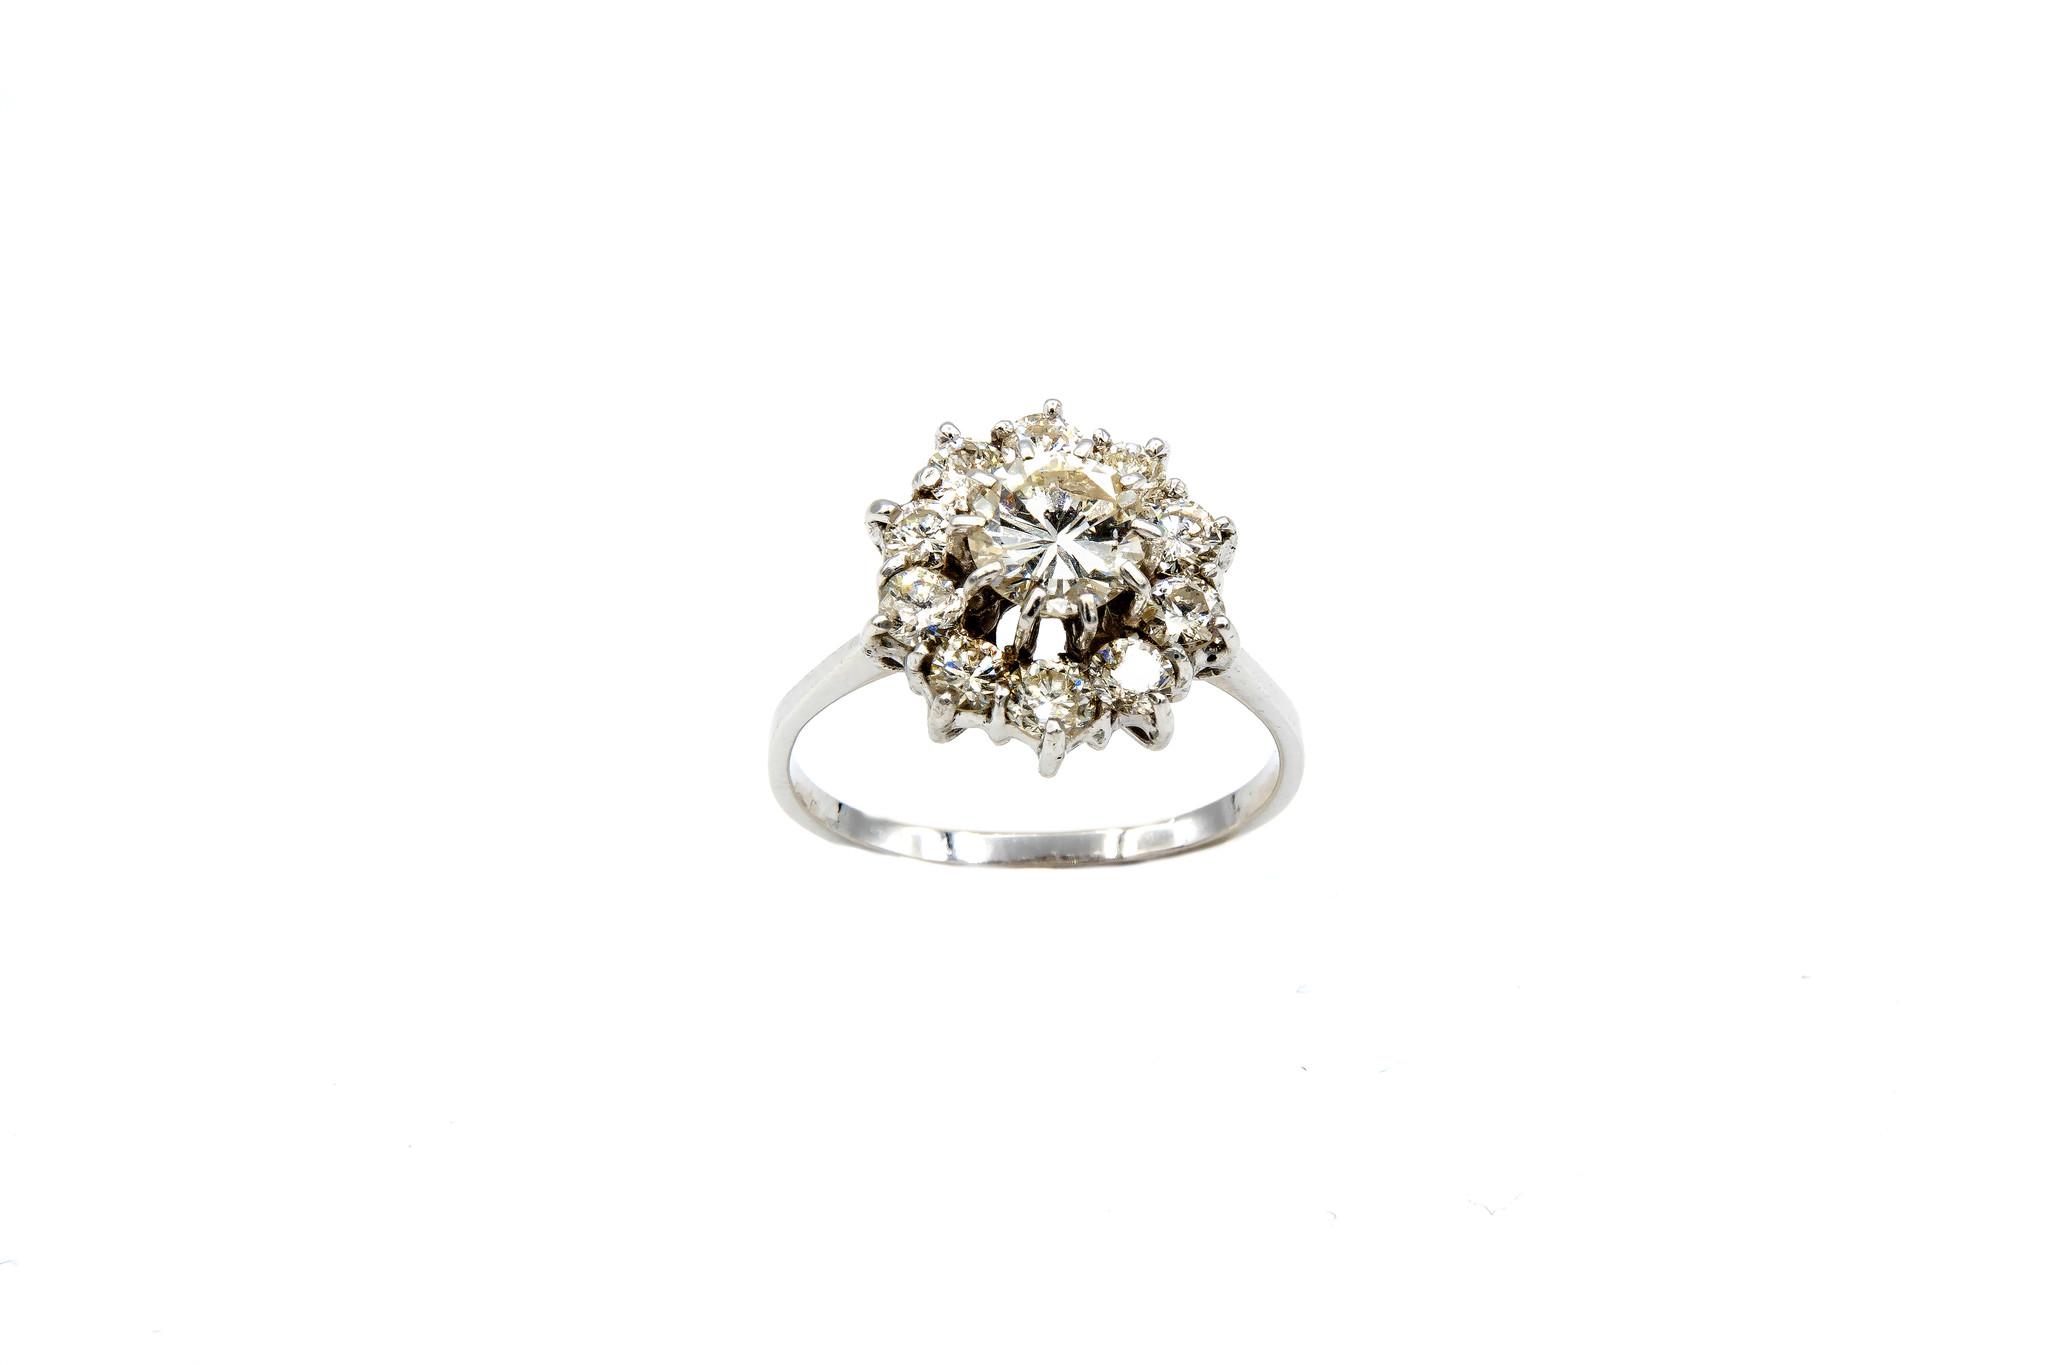 Ring verlovingsring grote synthetische diamant omringd door 10 lager ingezette diamanten witgoud-2